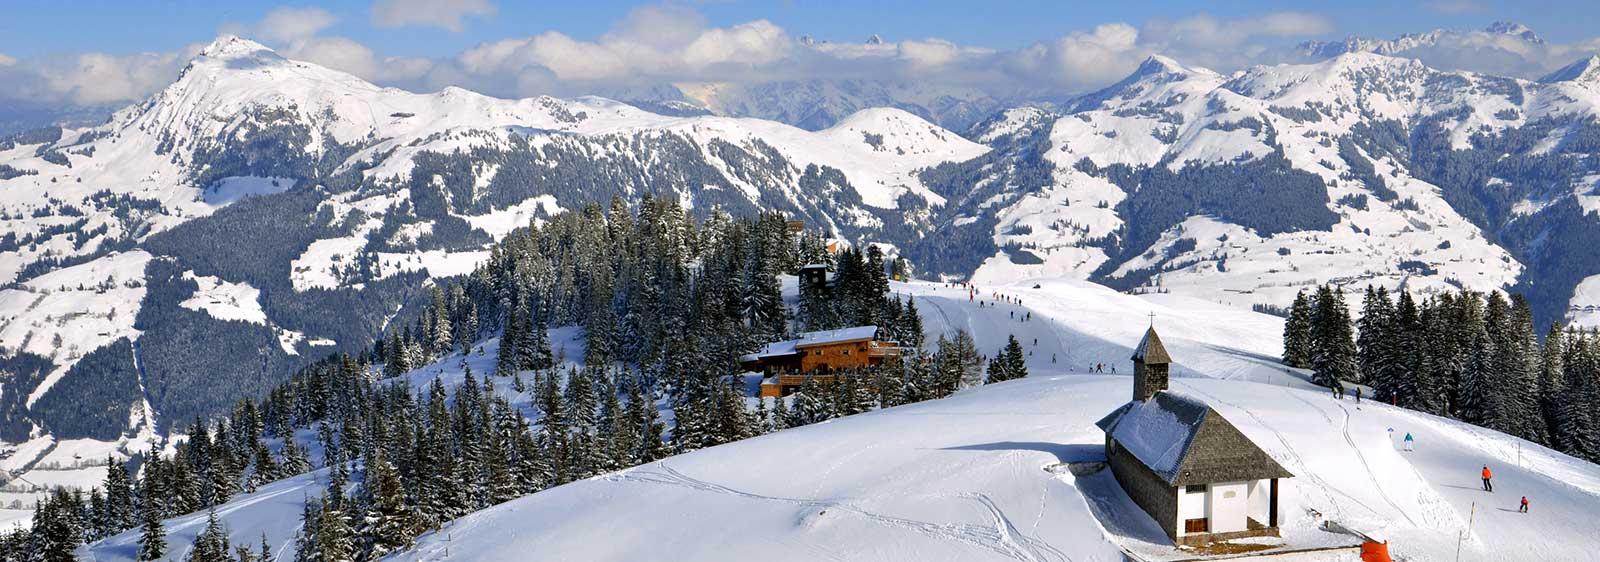 Kitzbuhel School Ski Trips